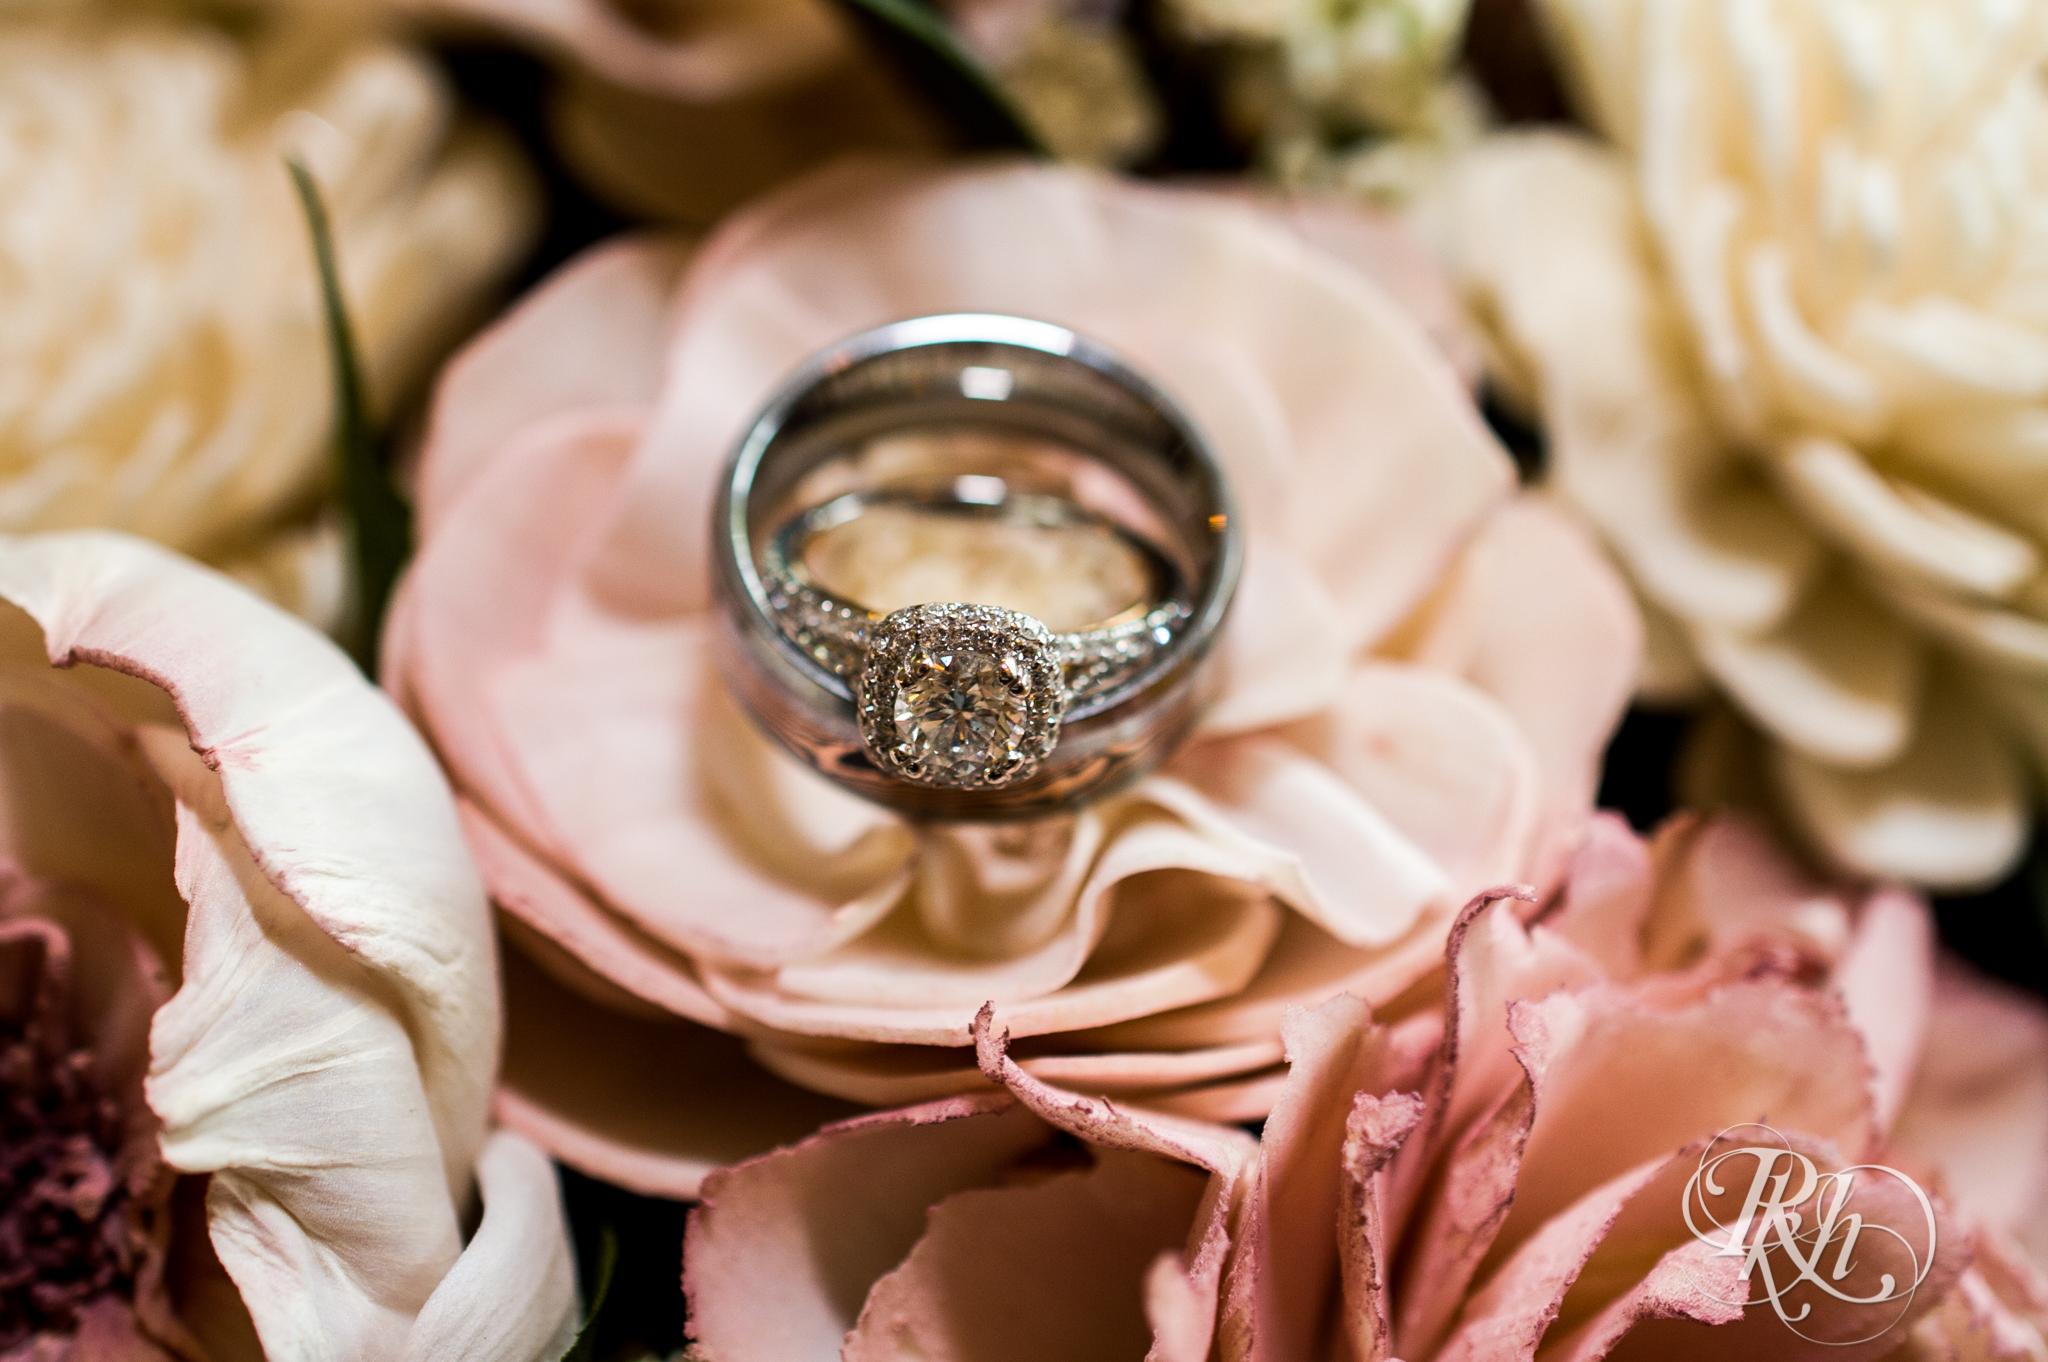 Ally & Nick - Minnesota Wedding Photography - Next Chapter Winery - RKH Images - Blog (10 of 57).jpg